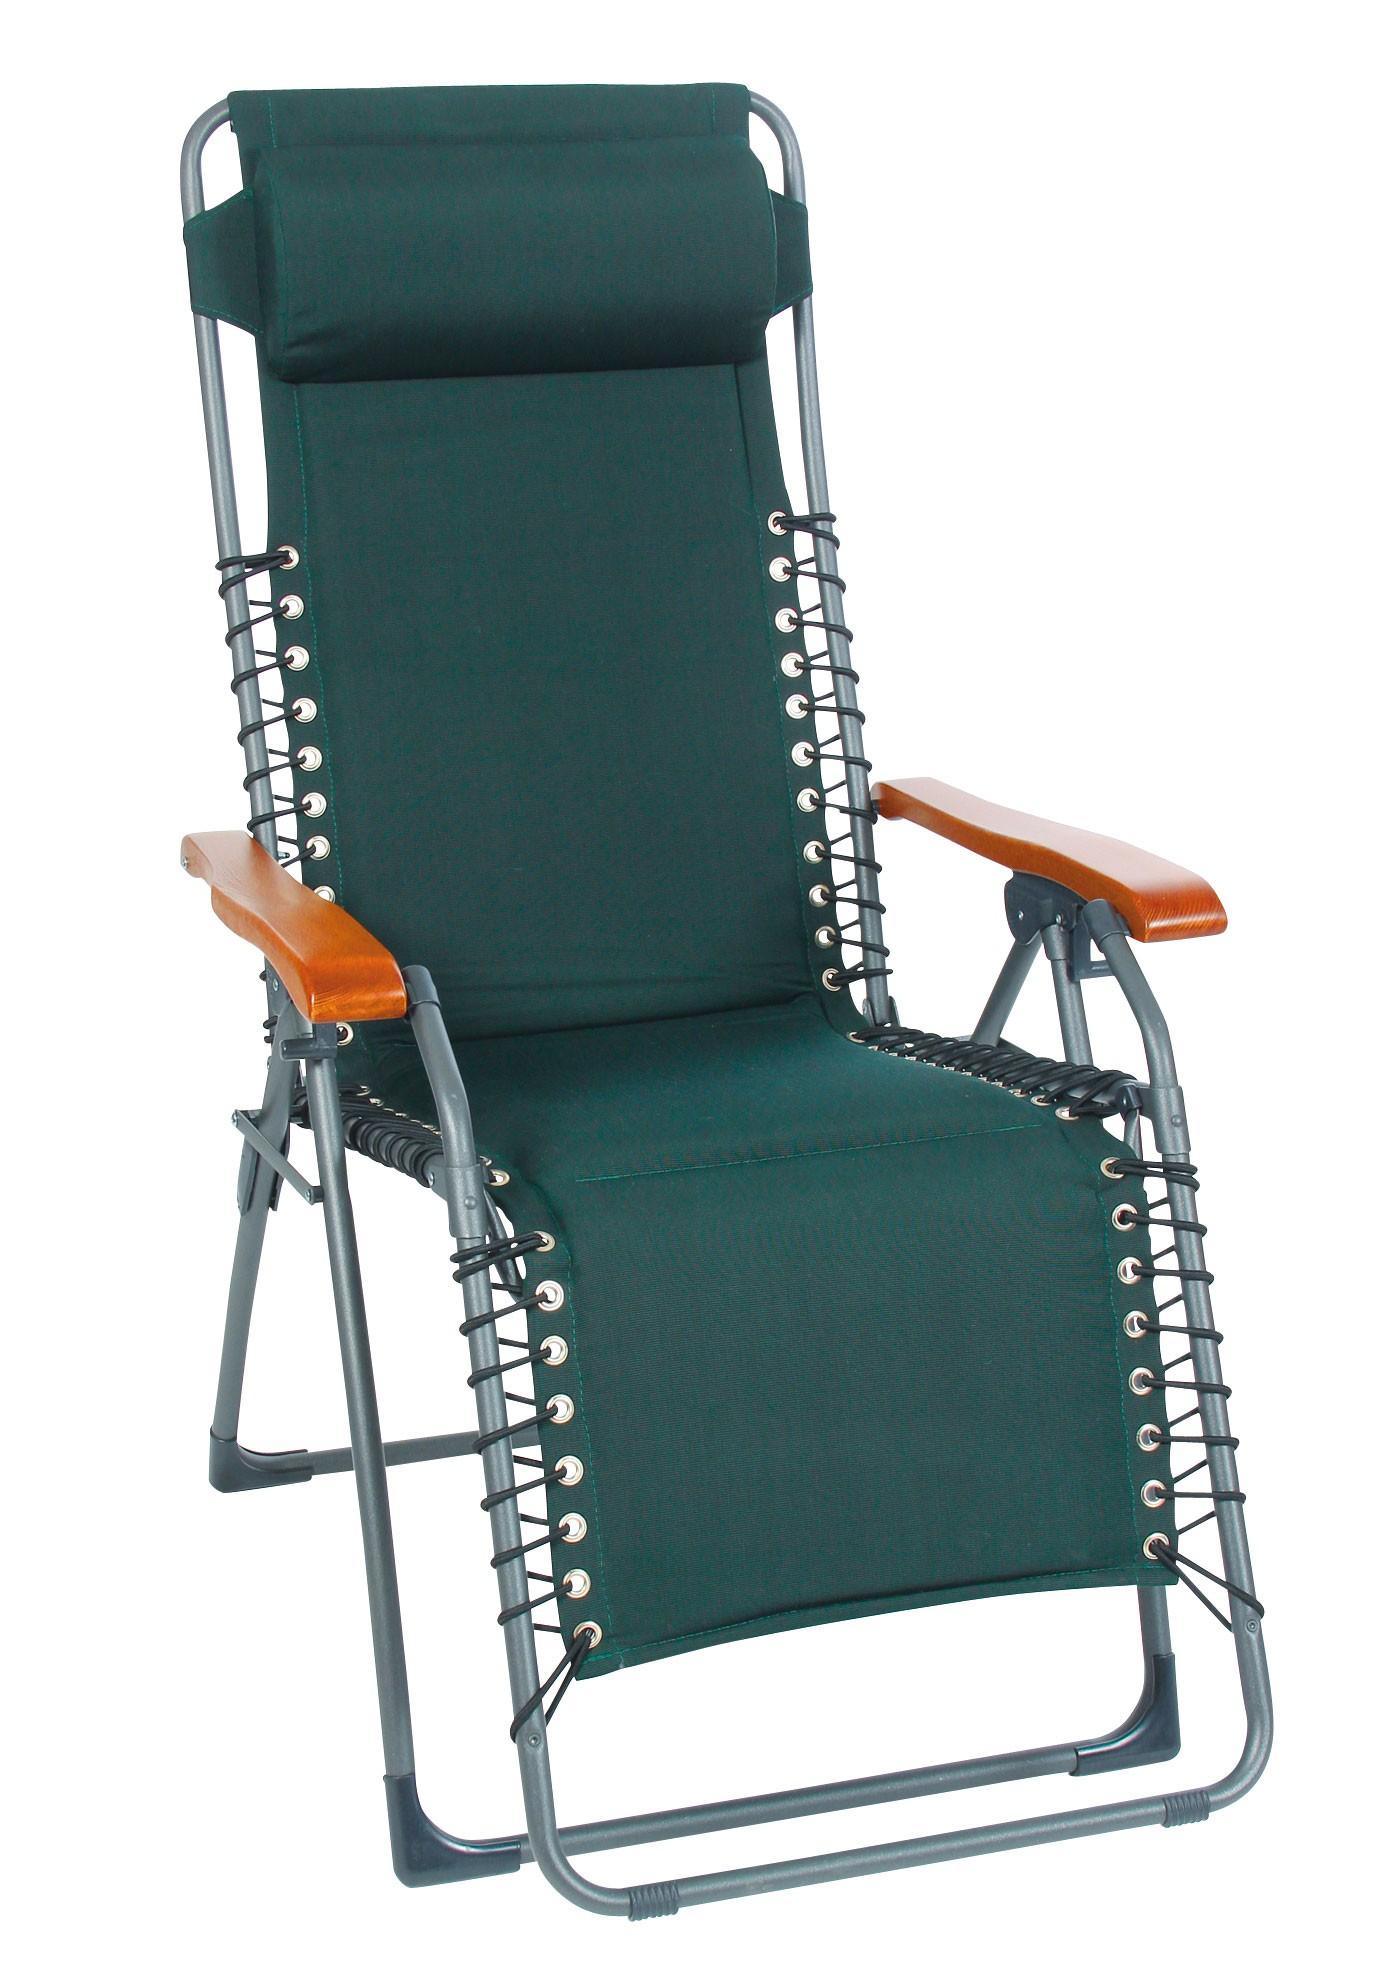 Sungörl Relaxsessel / Relaxliege Stahl Oasi Petra anthrazit / grün Bild 1